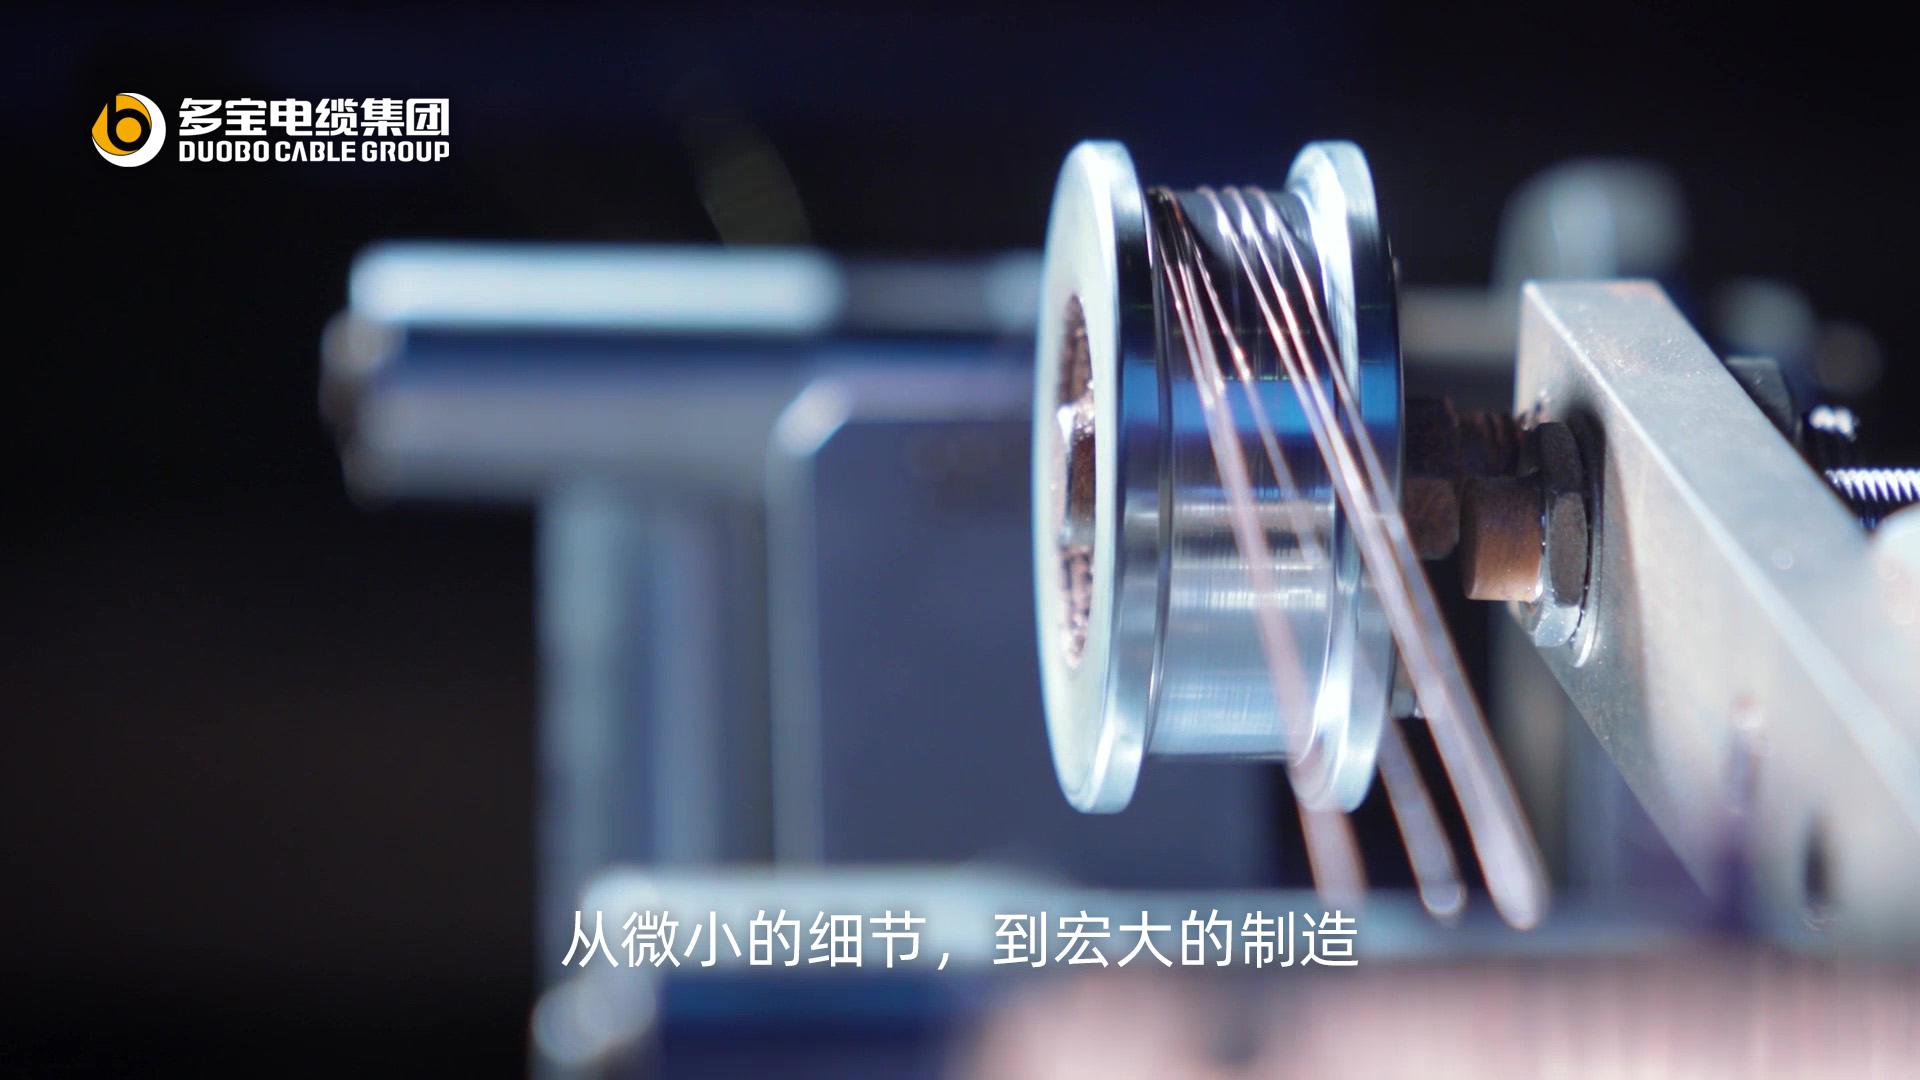 bt种子磁力電纜集團宣傳片-15s